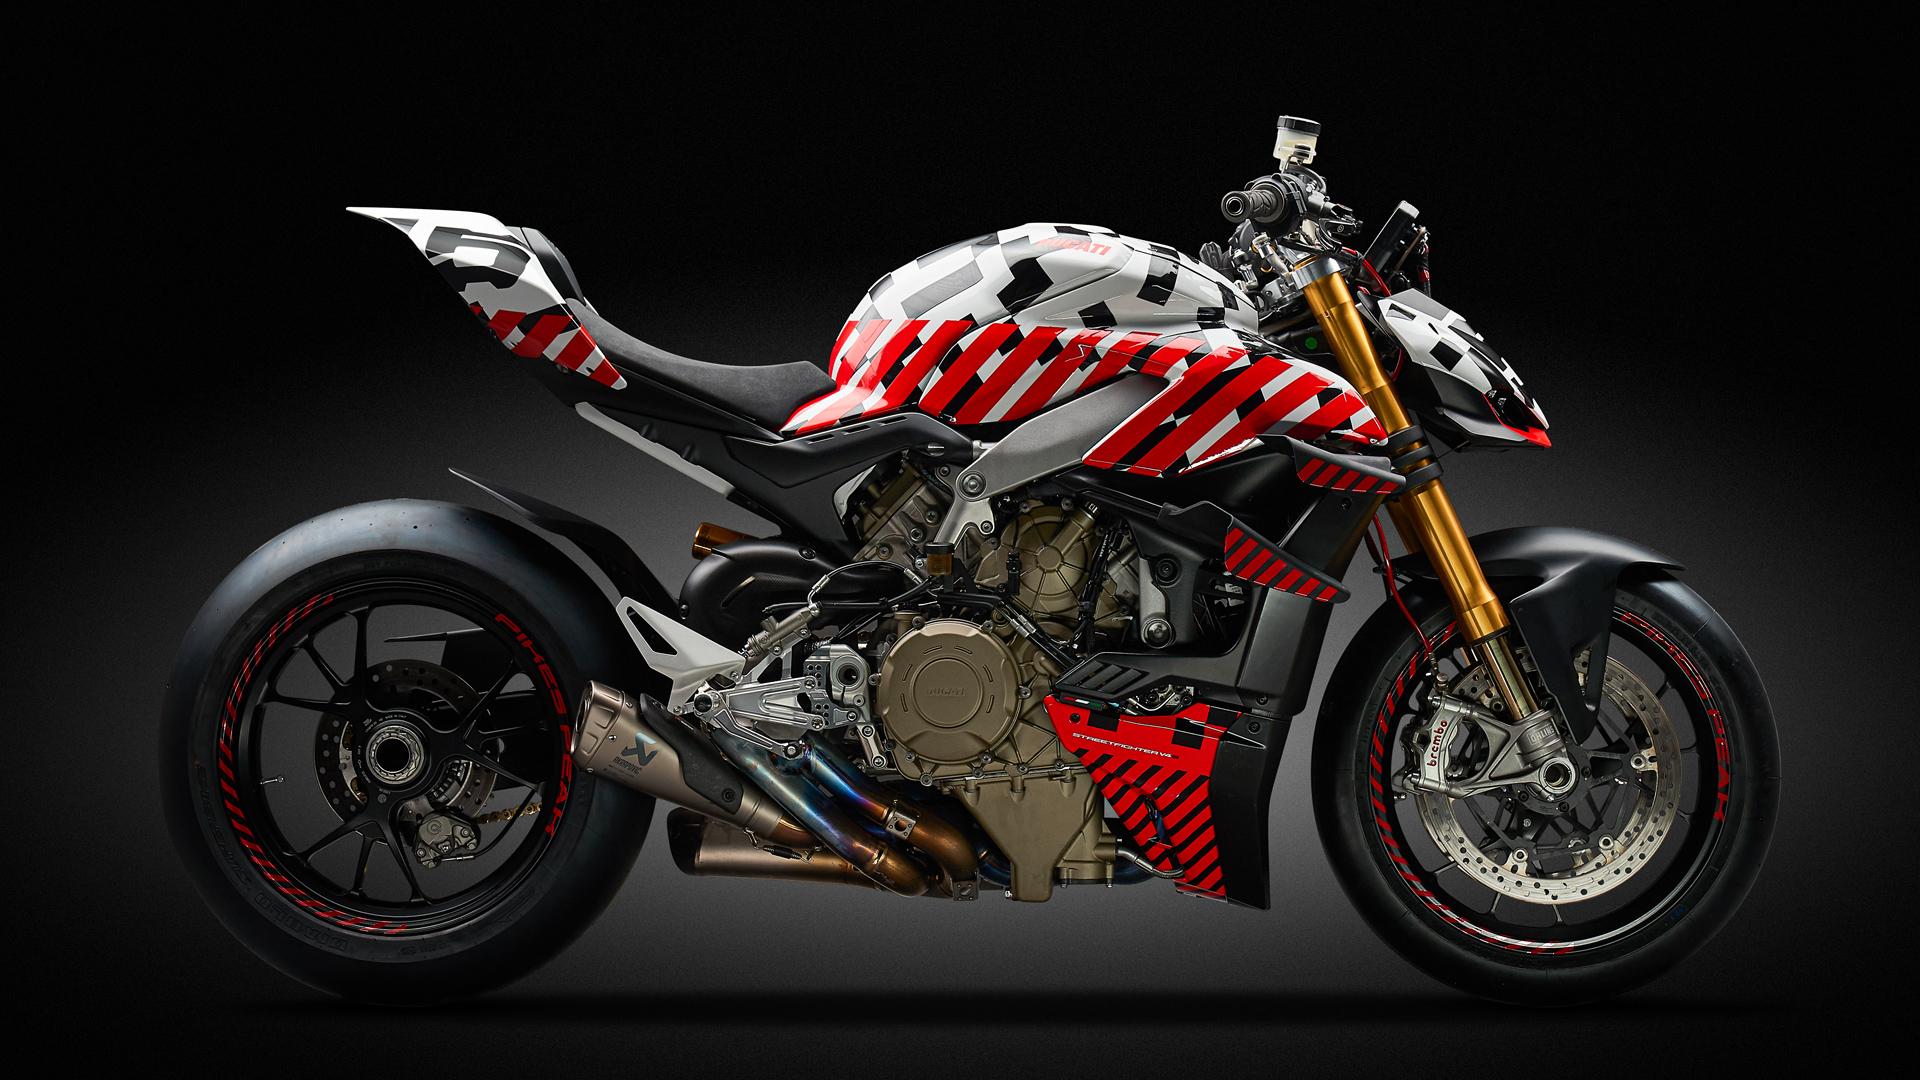 Ducati Streetfighter V4 vai acelerar na rampa de Pikes Peak